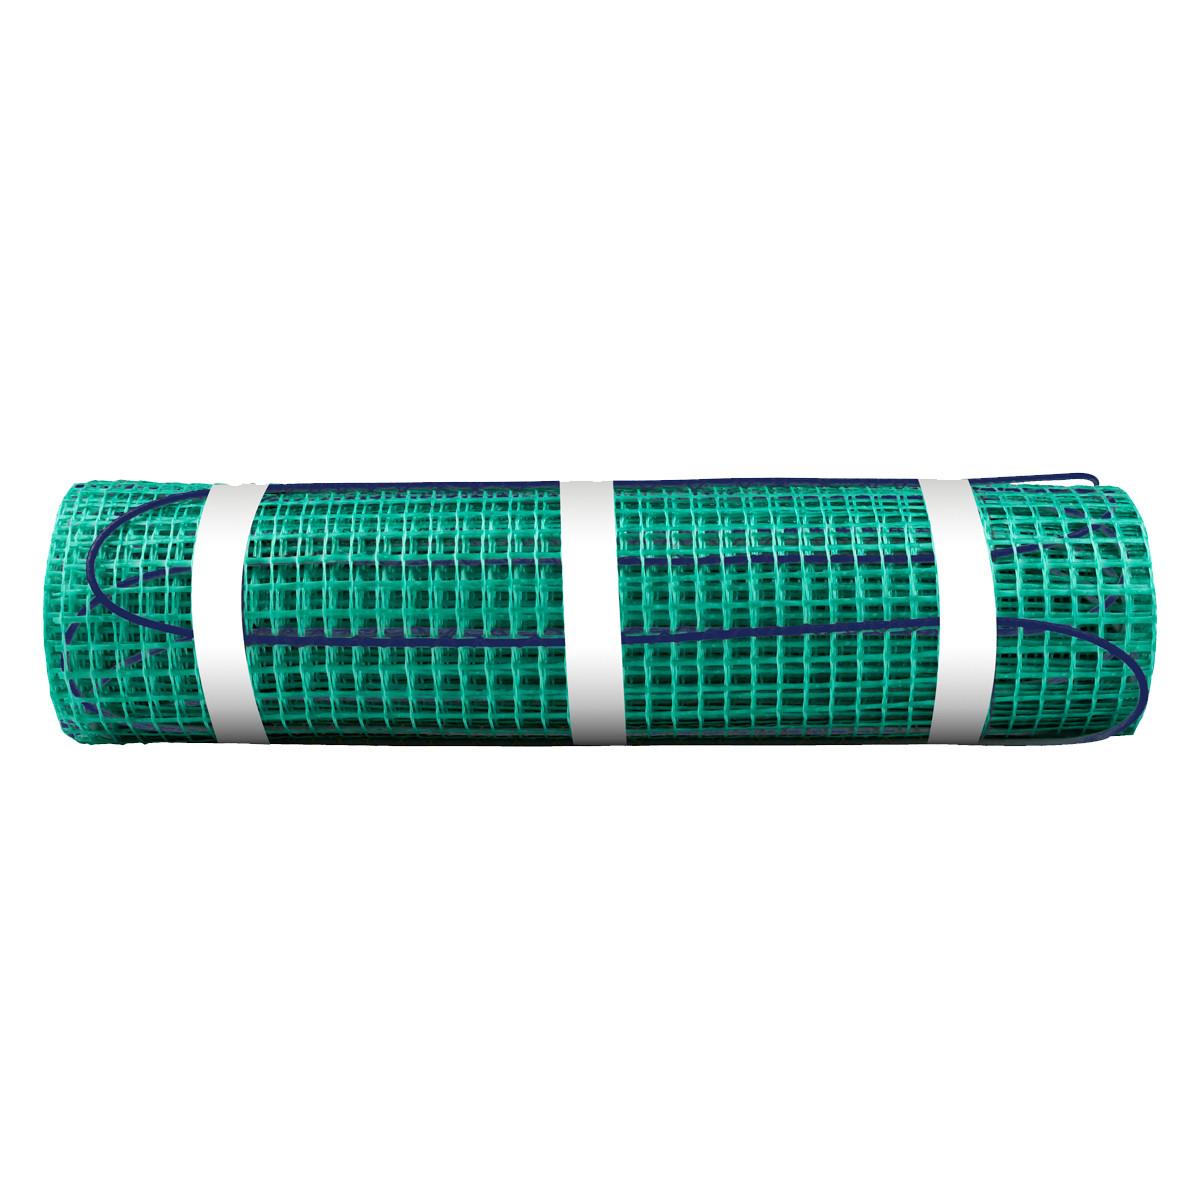 WarmlyYours TRT120-1.5x12 TempZone 120V 2.3A 1.5 Foot x 12 Foot Flex Roll